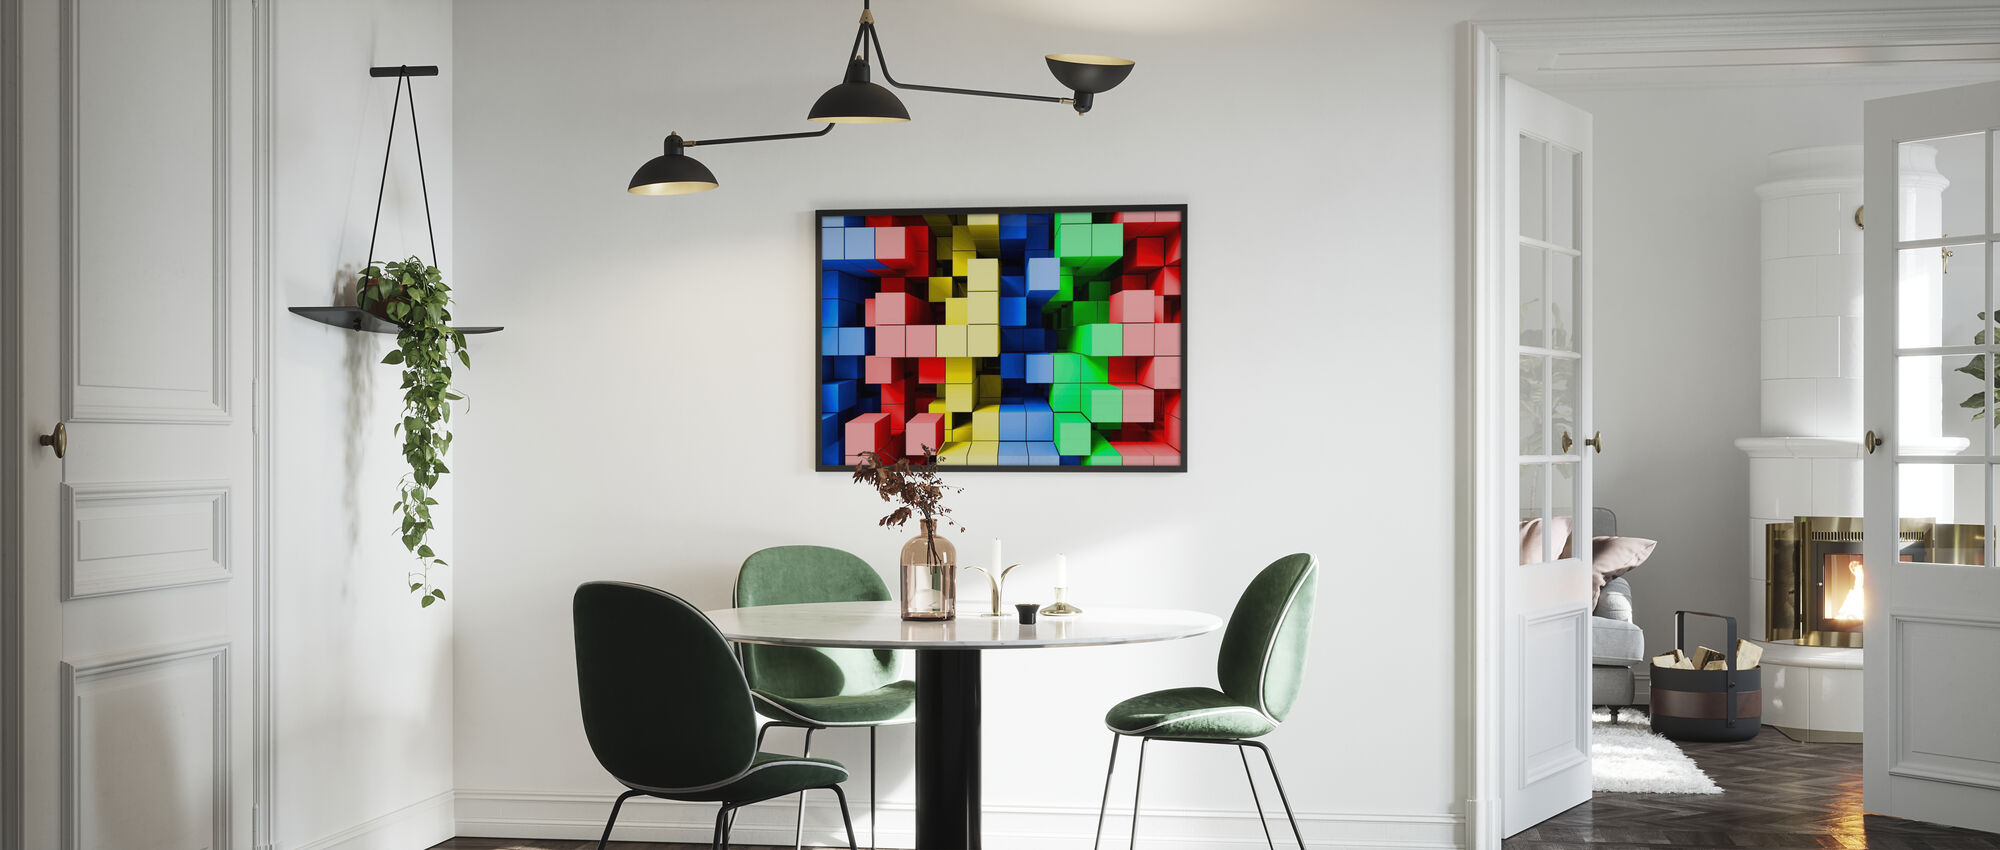 Djup Tetris färg - Poster - Kök